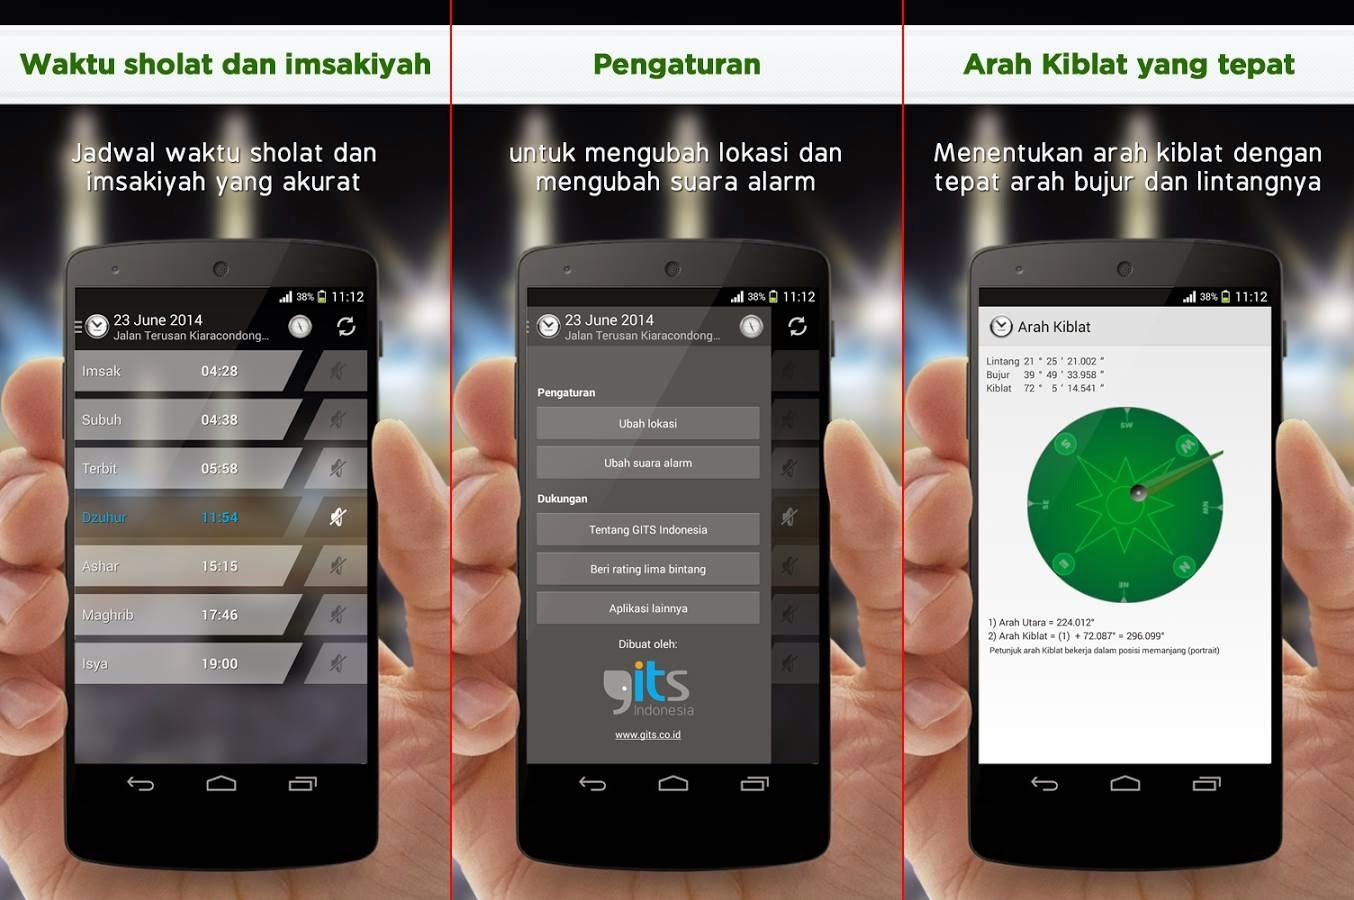 Aplikasi Jadwal Imsakiyah Bulan Ramadhan 2014